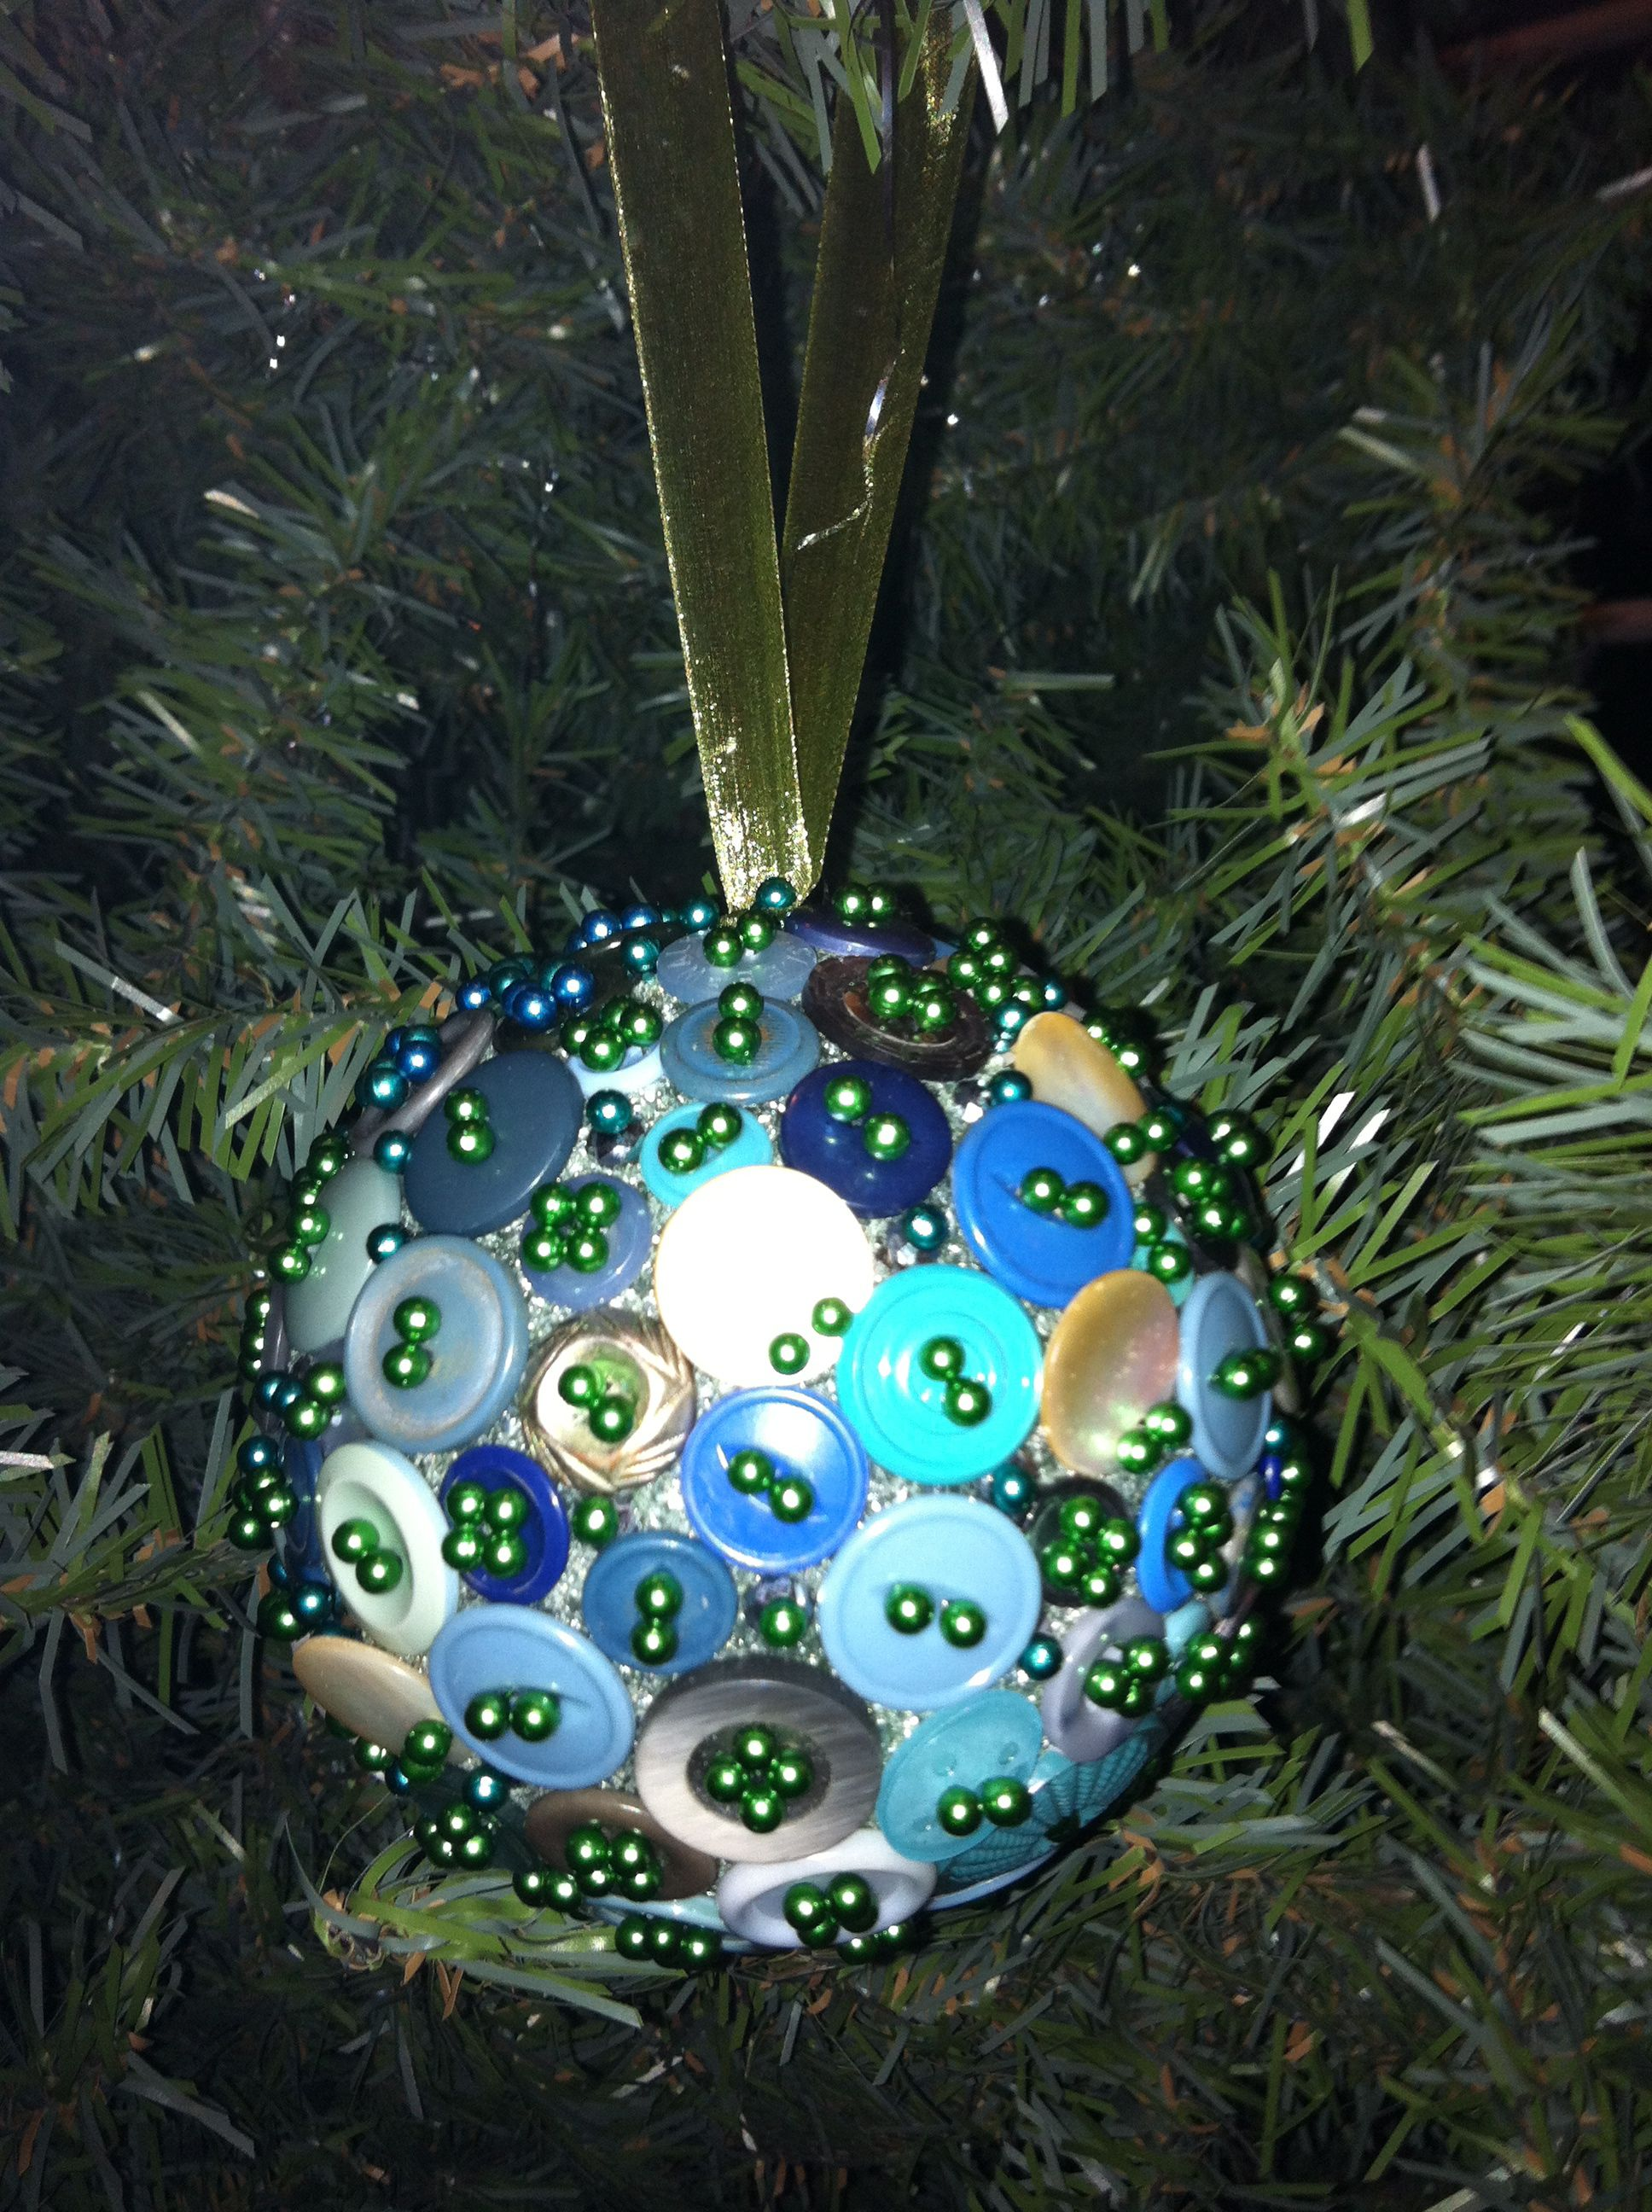 Home made button ornament.